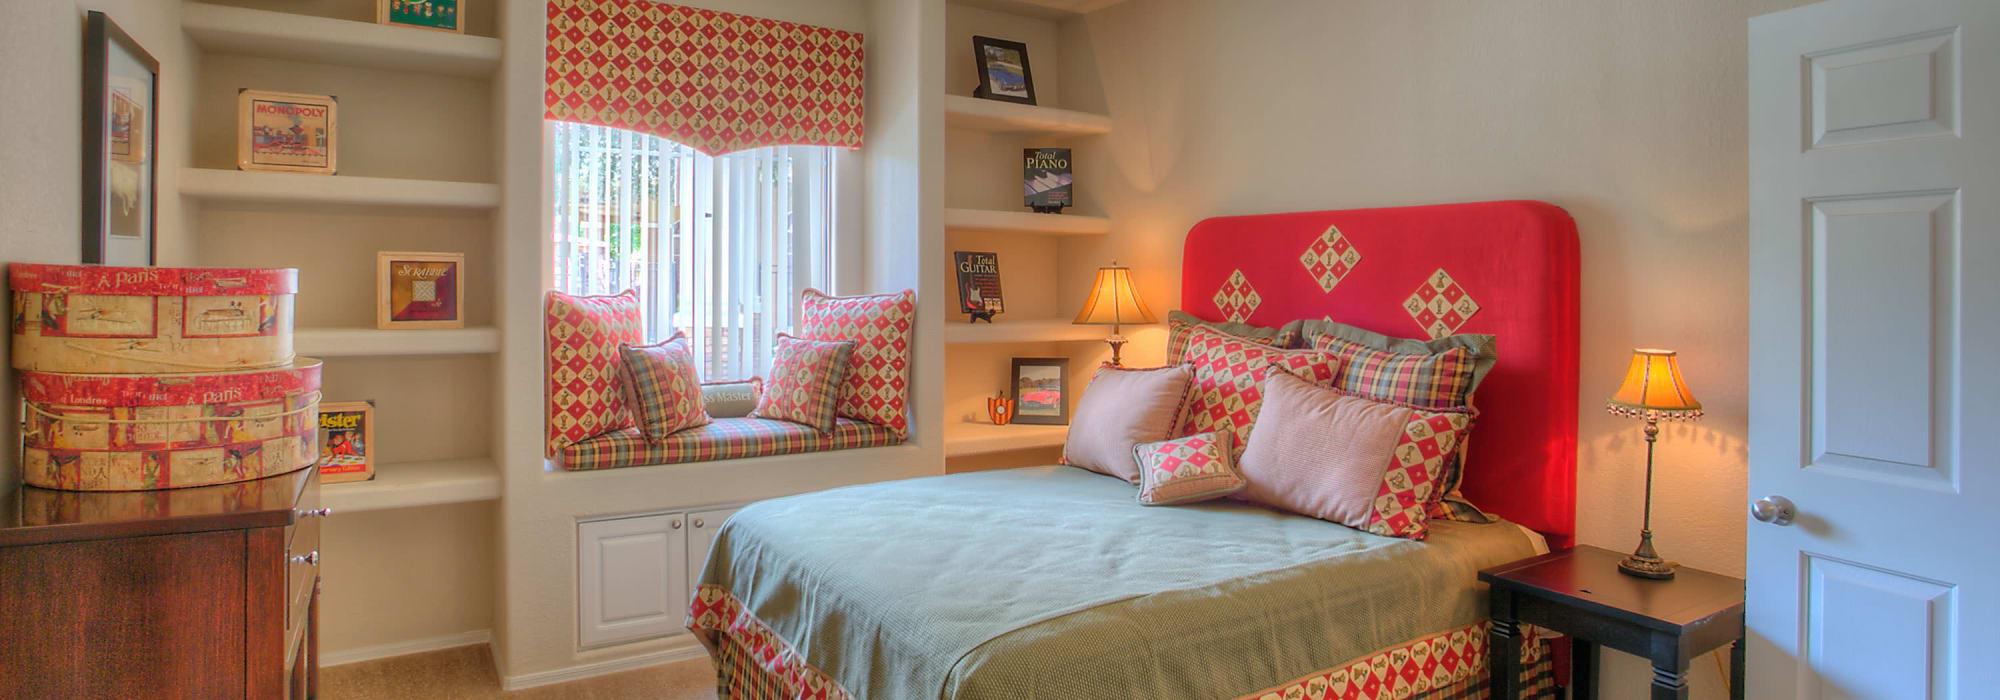 Bedroom at Remington Ranch in Litchfield Park, Arizona